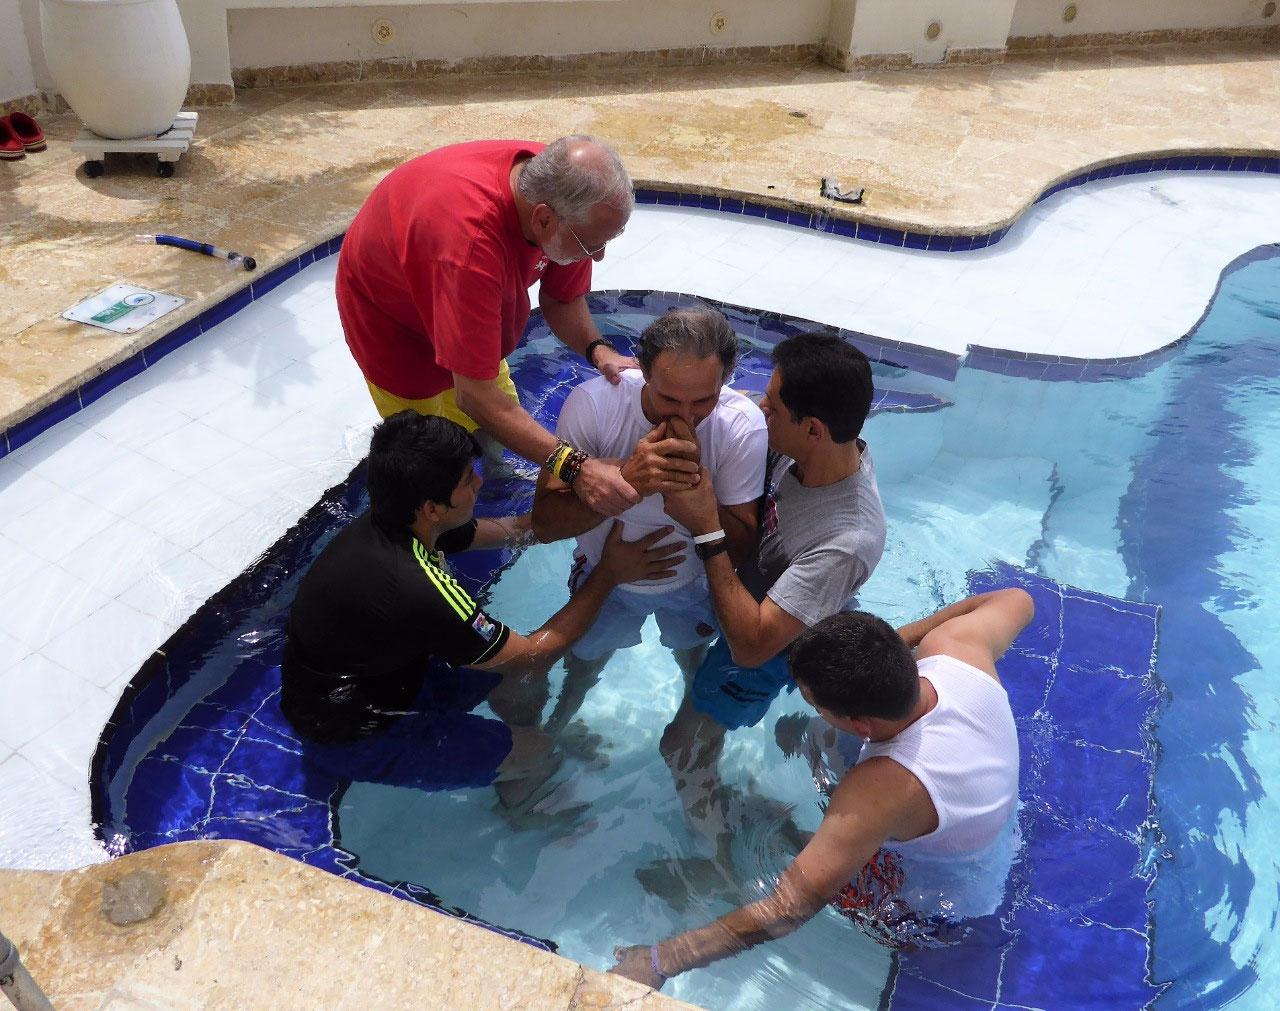 Cristian, Scott, Miguel, Jaime, and Oscar